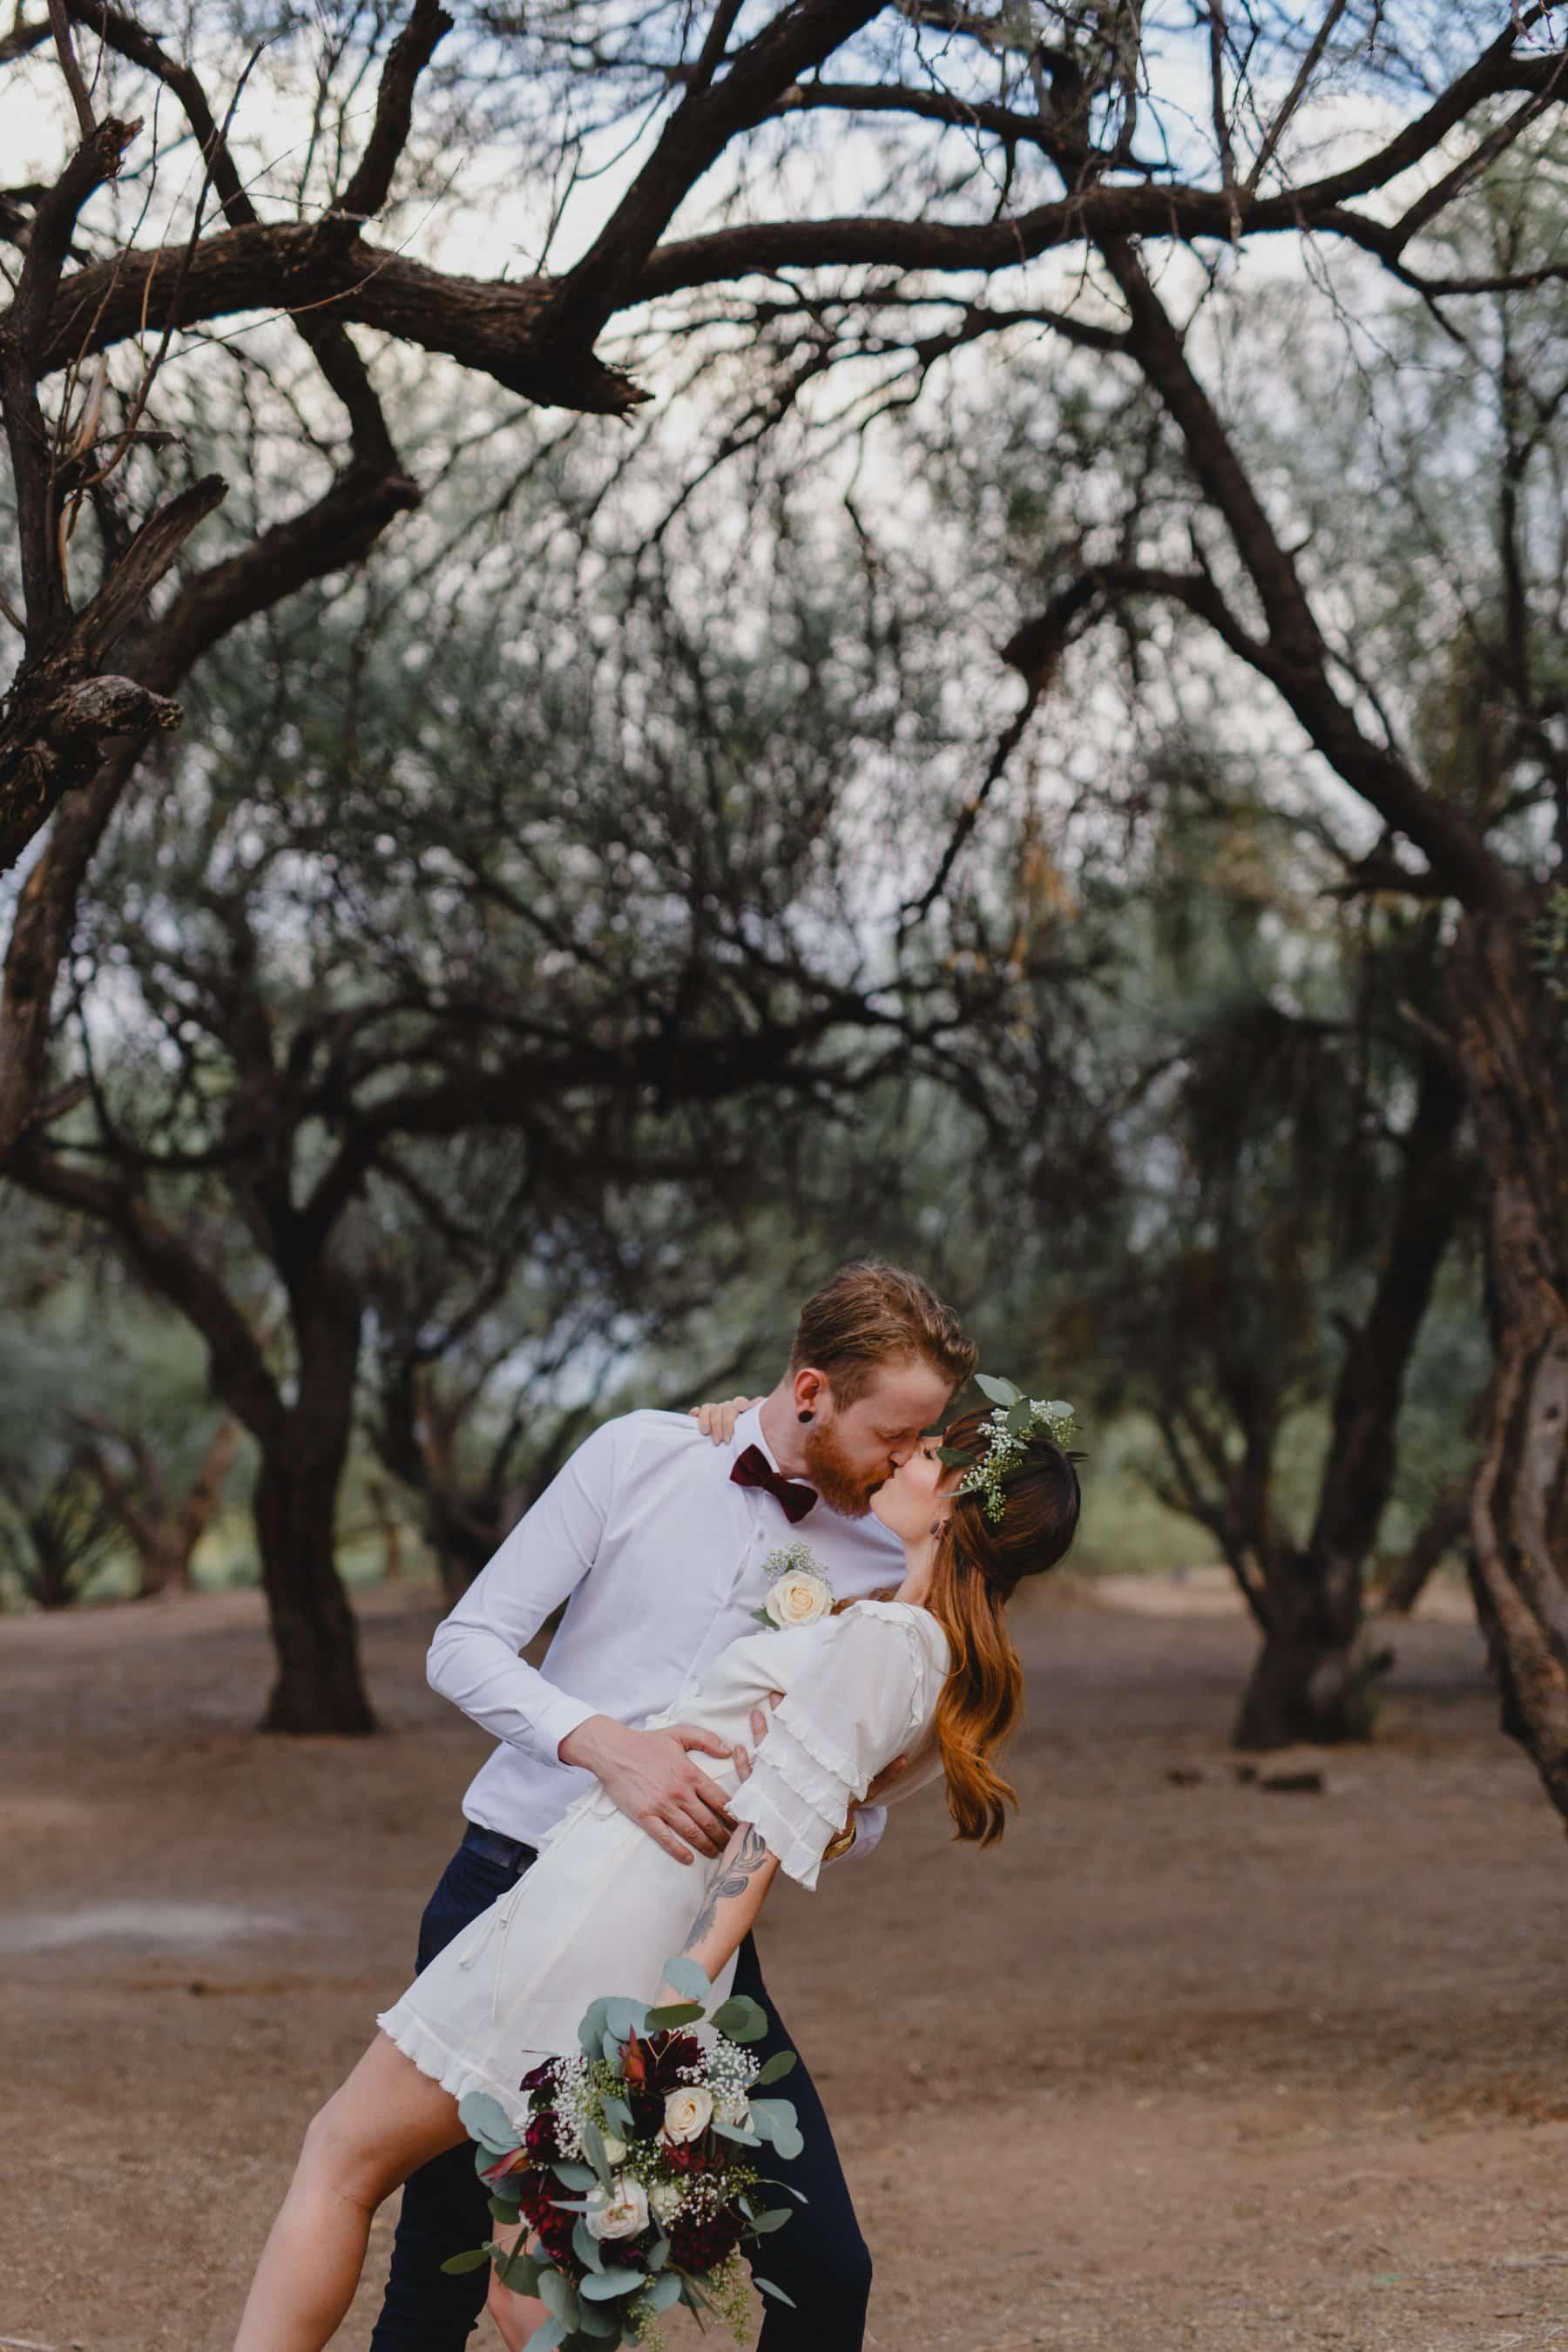 boho forest elopement location in Phoenix